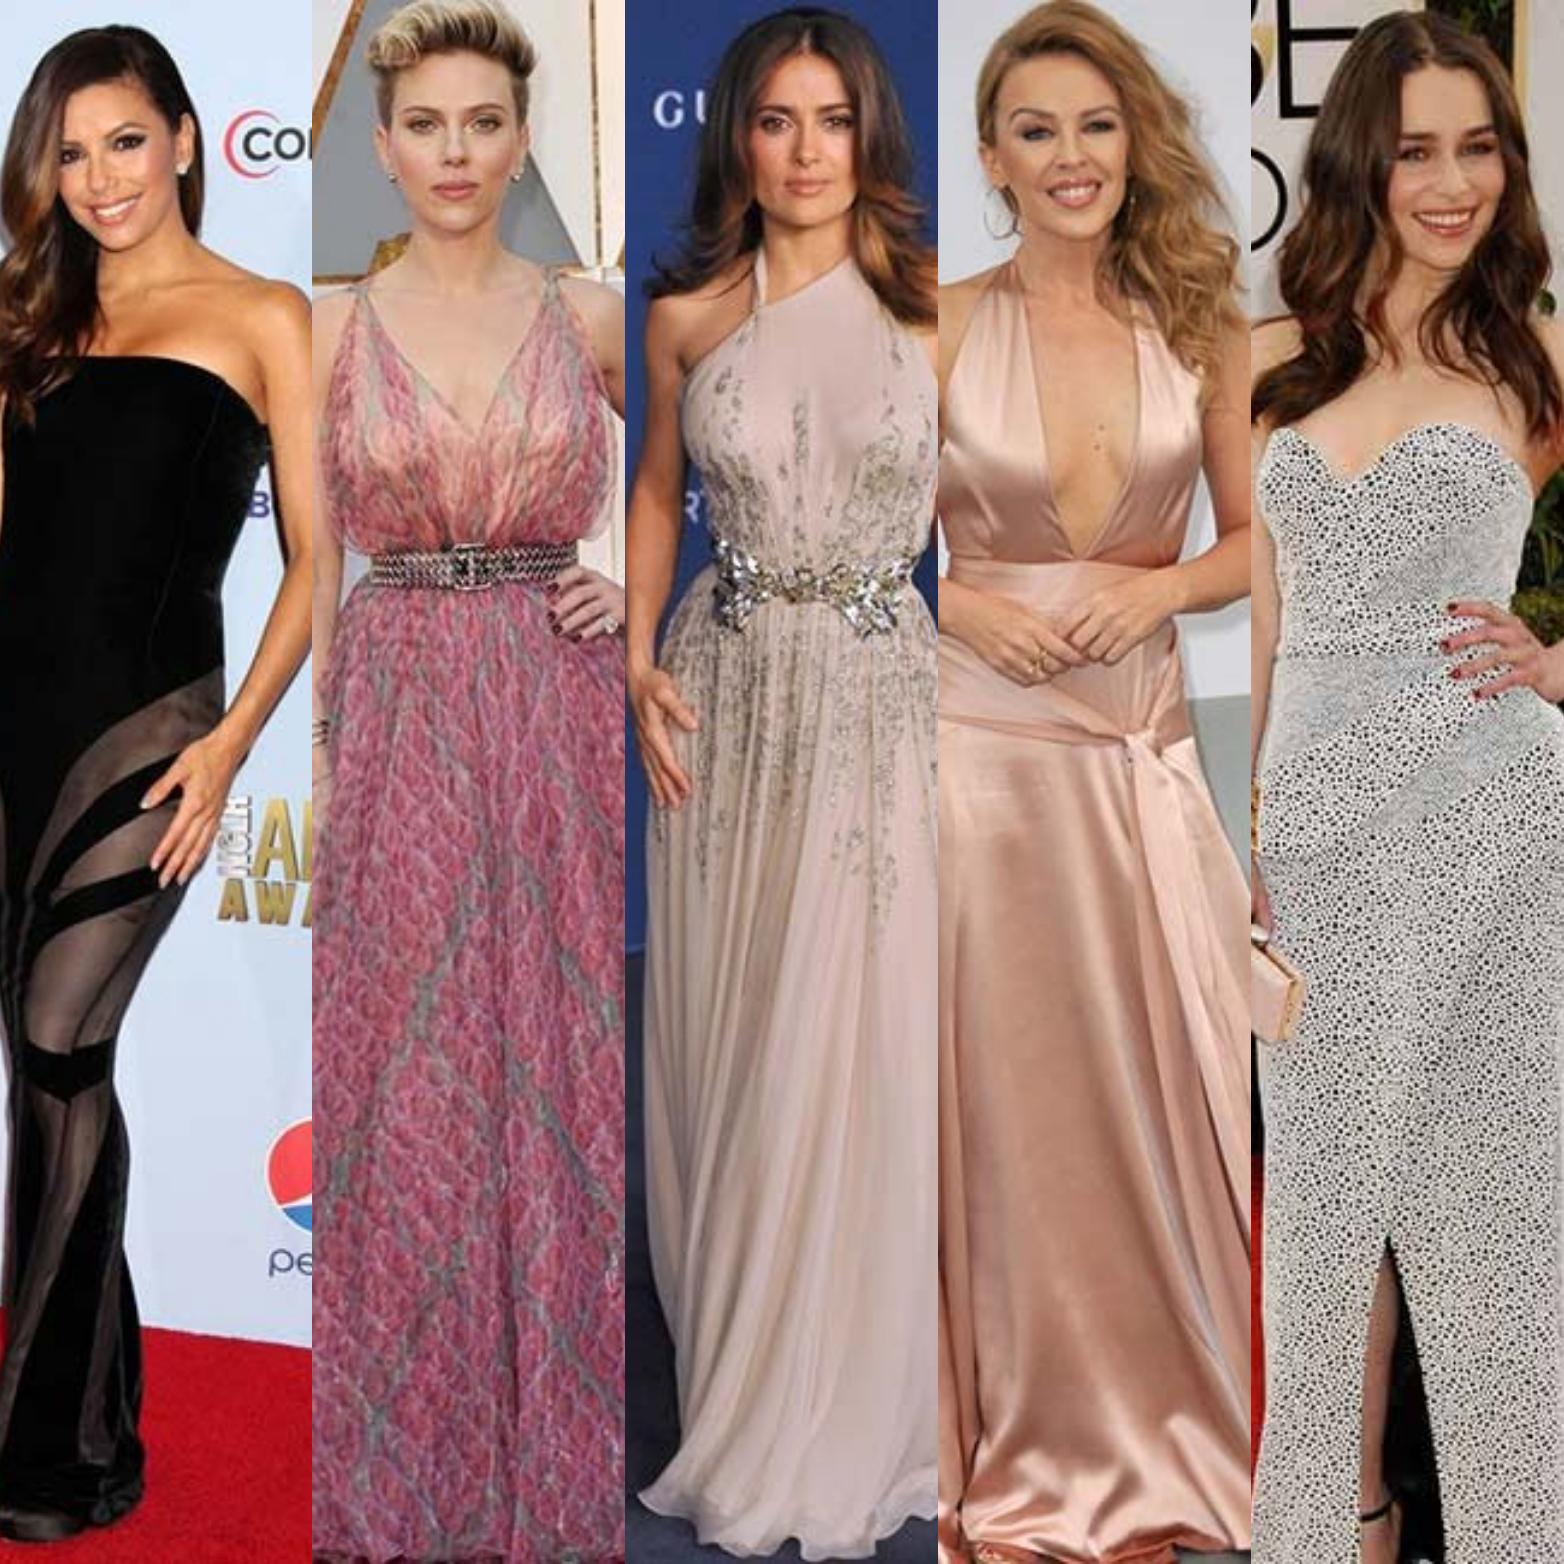 Four famously petite women Eva Longoria, Scarlett Johansson, Kylie Minogue and Emilia Clarke